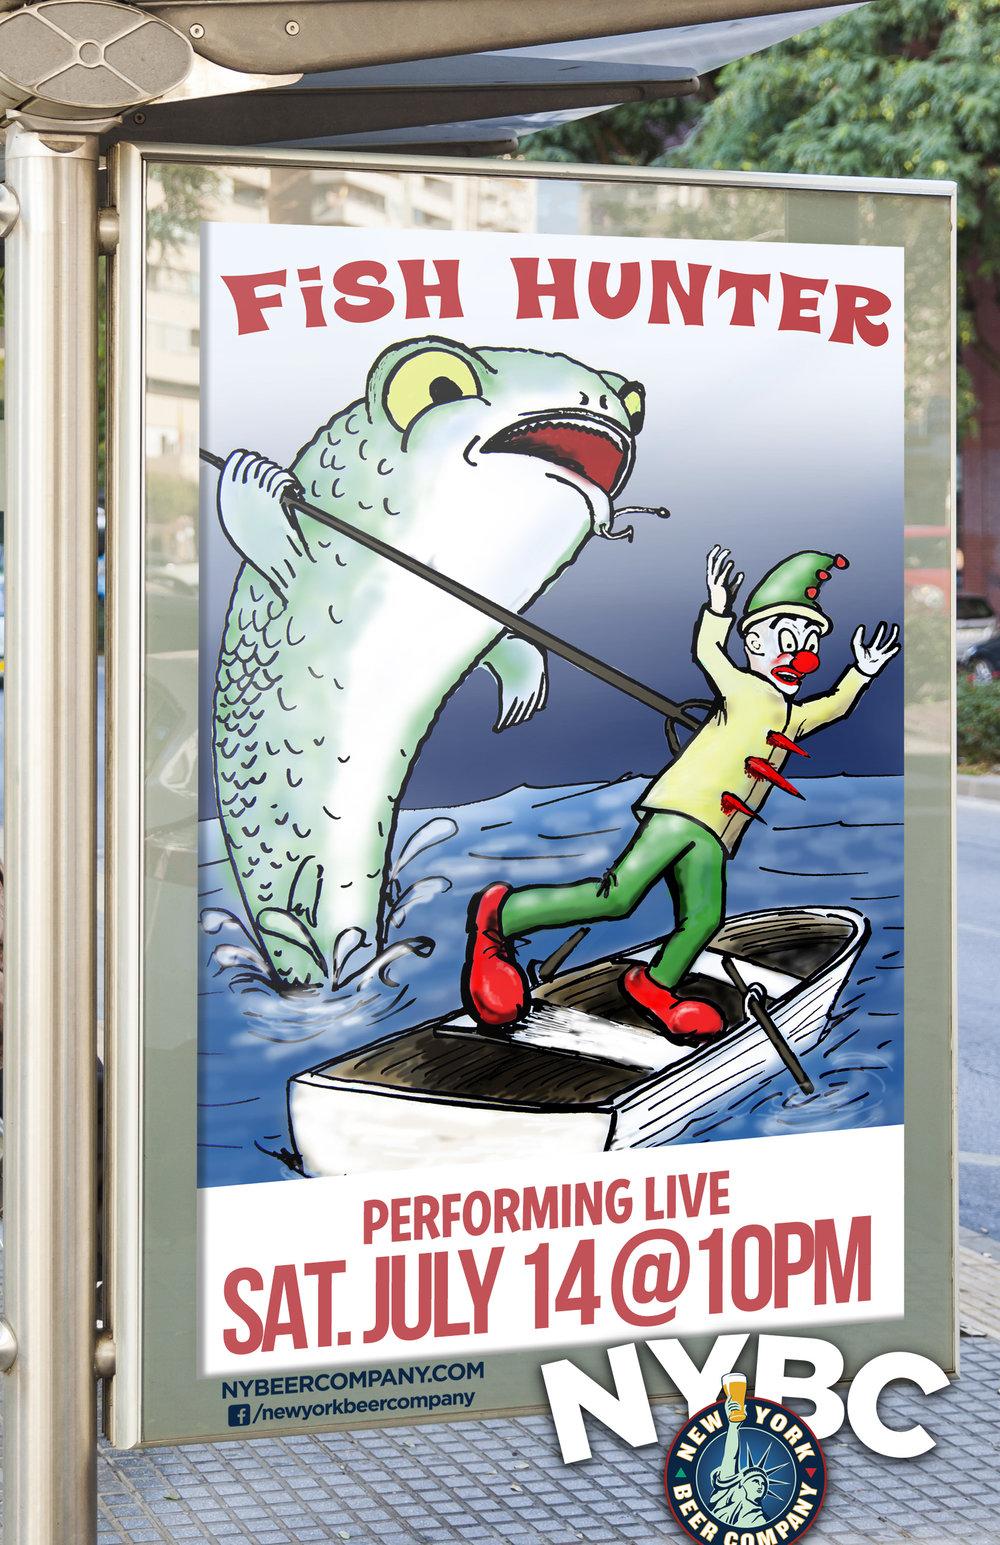 Fish Hunter band - Live MUSIC NYC